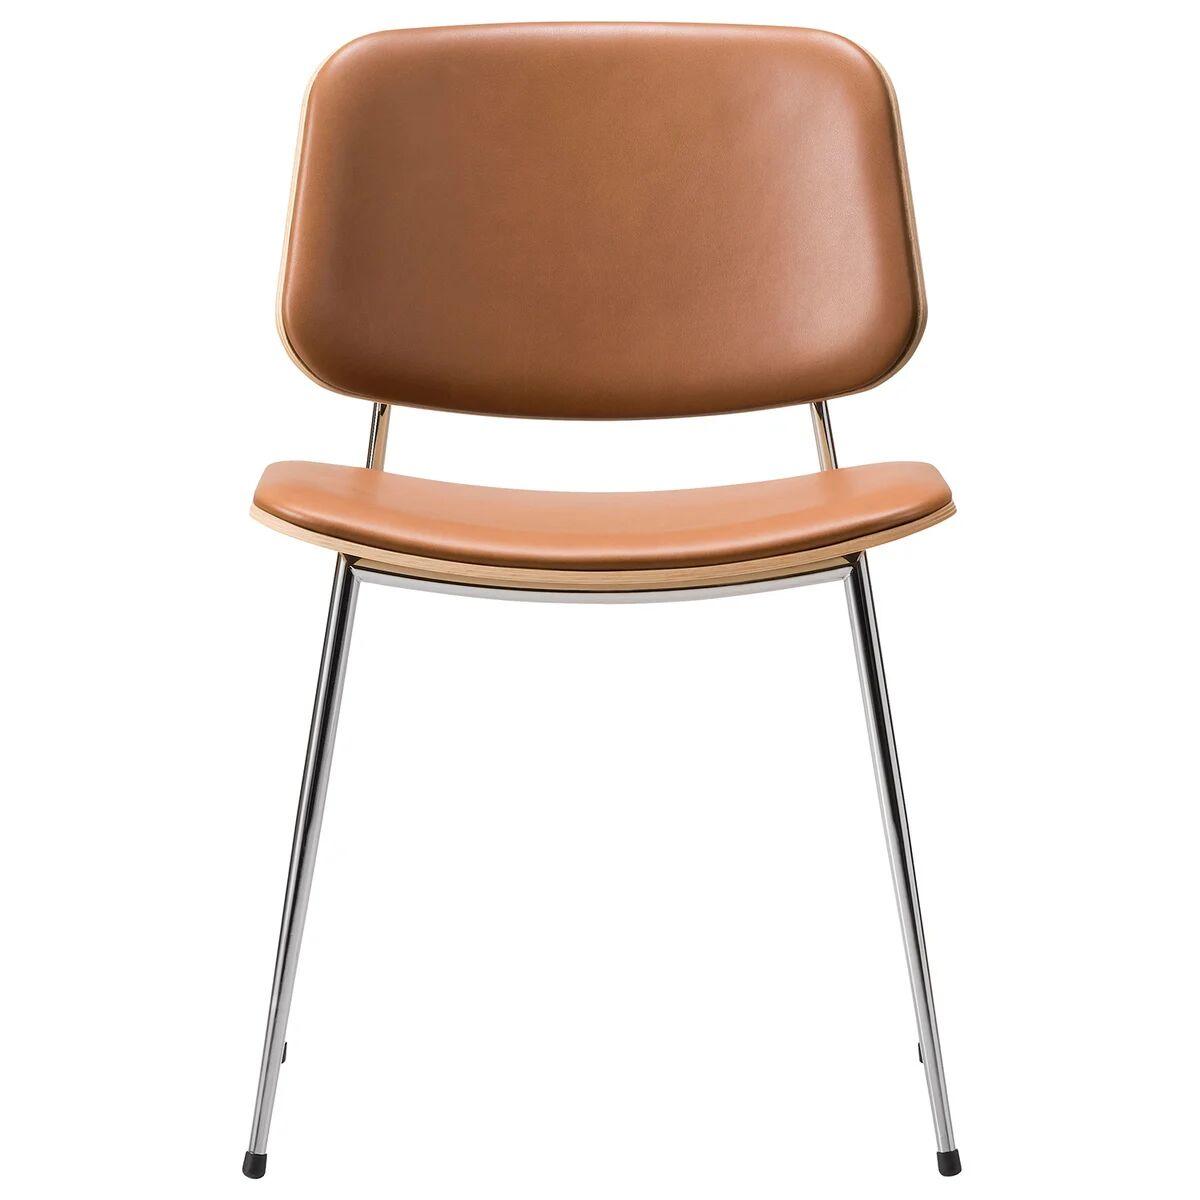 Fredericia S�borg tuoli 3062, kromattu runko, lakattu tammi - ruskea nahka